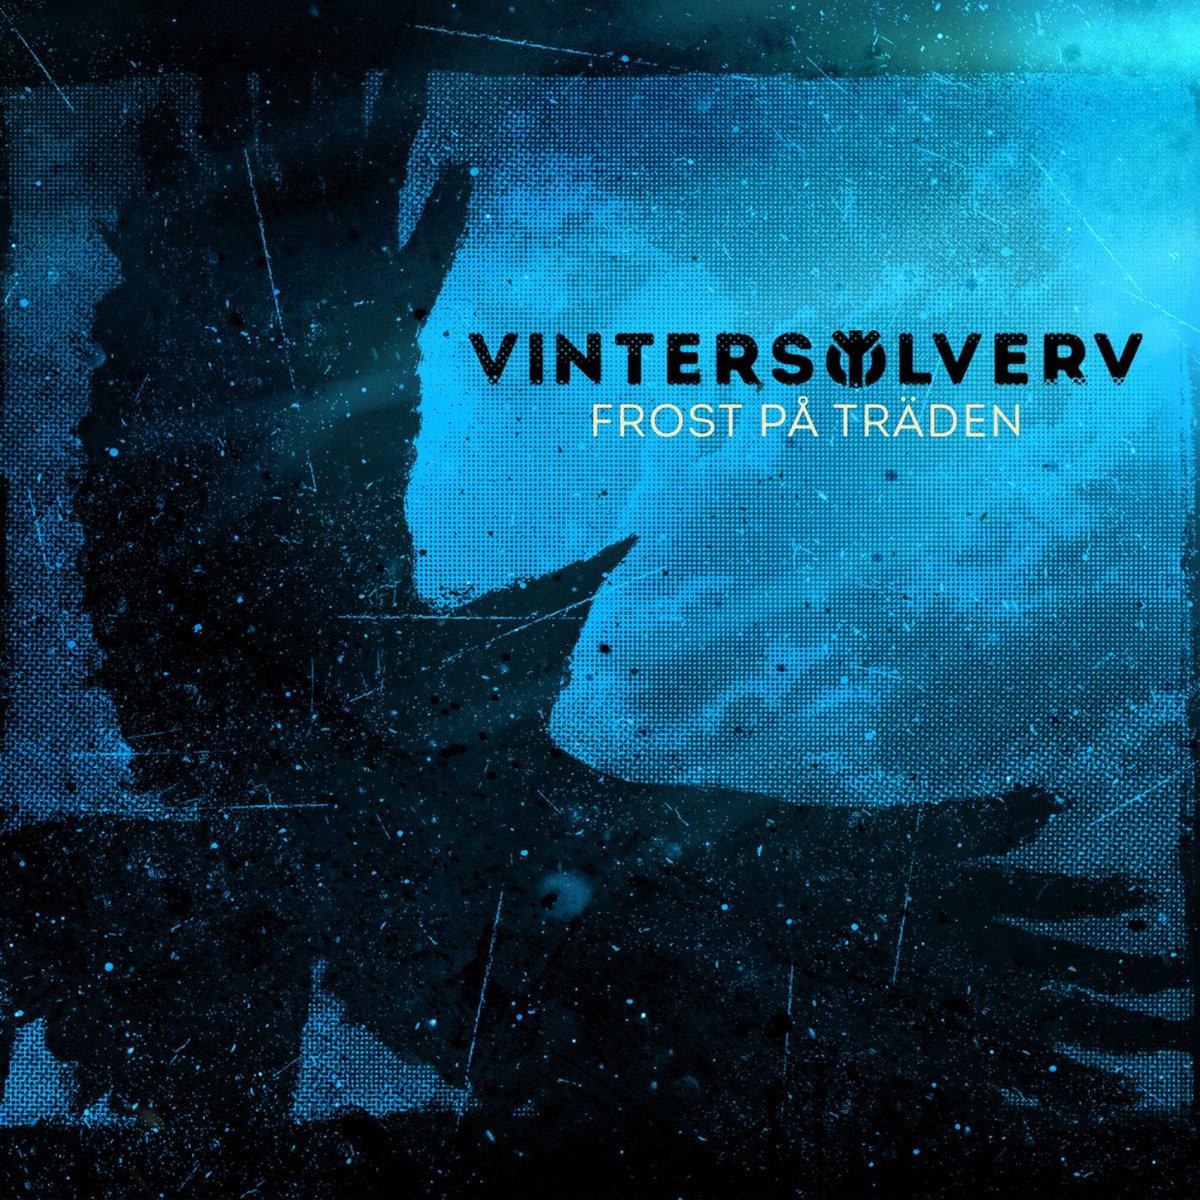 VINTERSOLVERV: Frost pa traden【予約受付中】